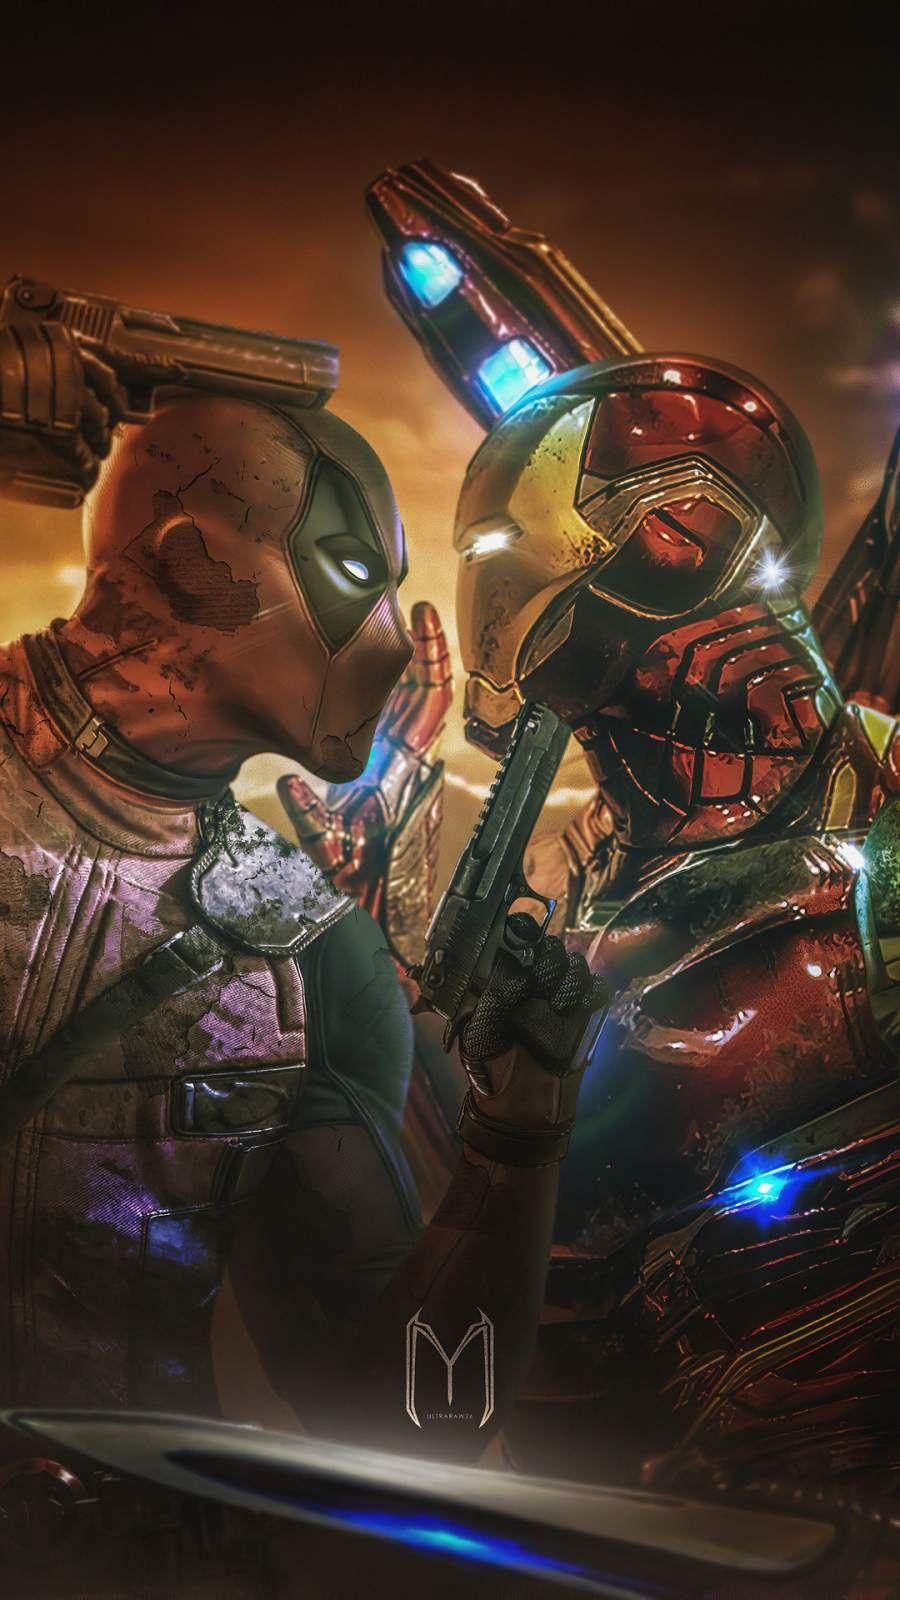 Deadpool Vs Iron Man Iphone Wallpaper Marvel Superhero Posters Superhero Wallpaper Deadpool Hd Wallpaper